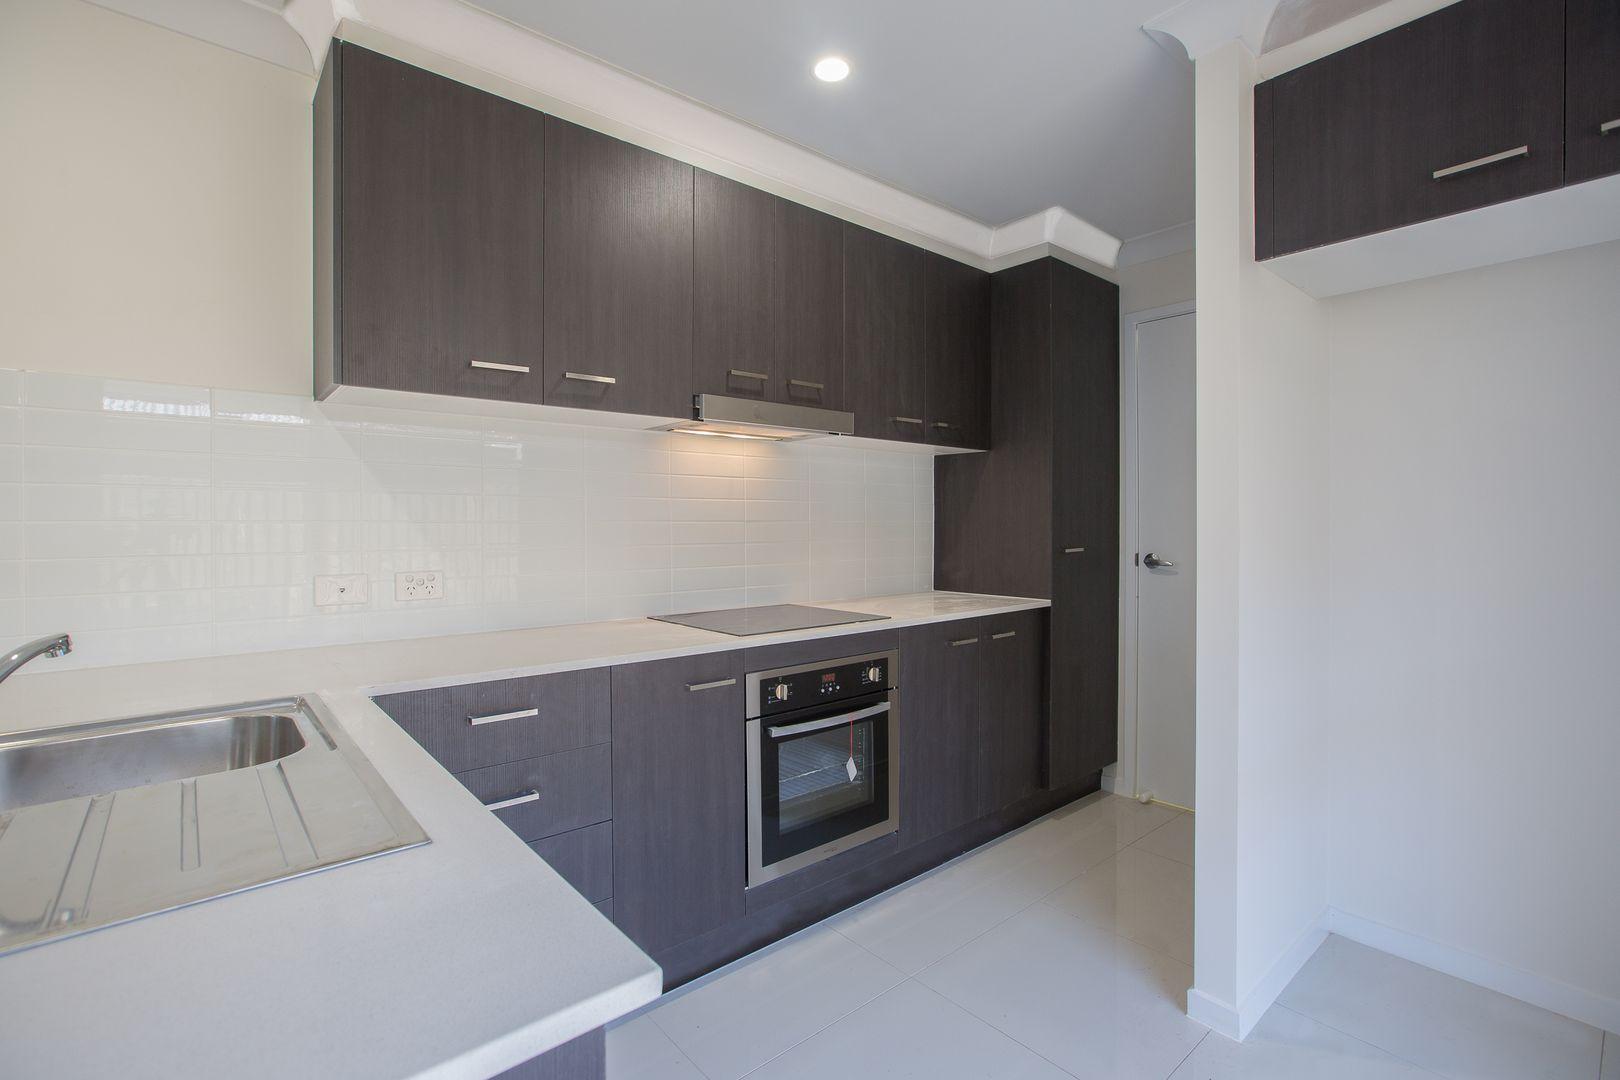 2/6 Miamax Place, Logan Reserve QLD 4133, Image 1